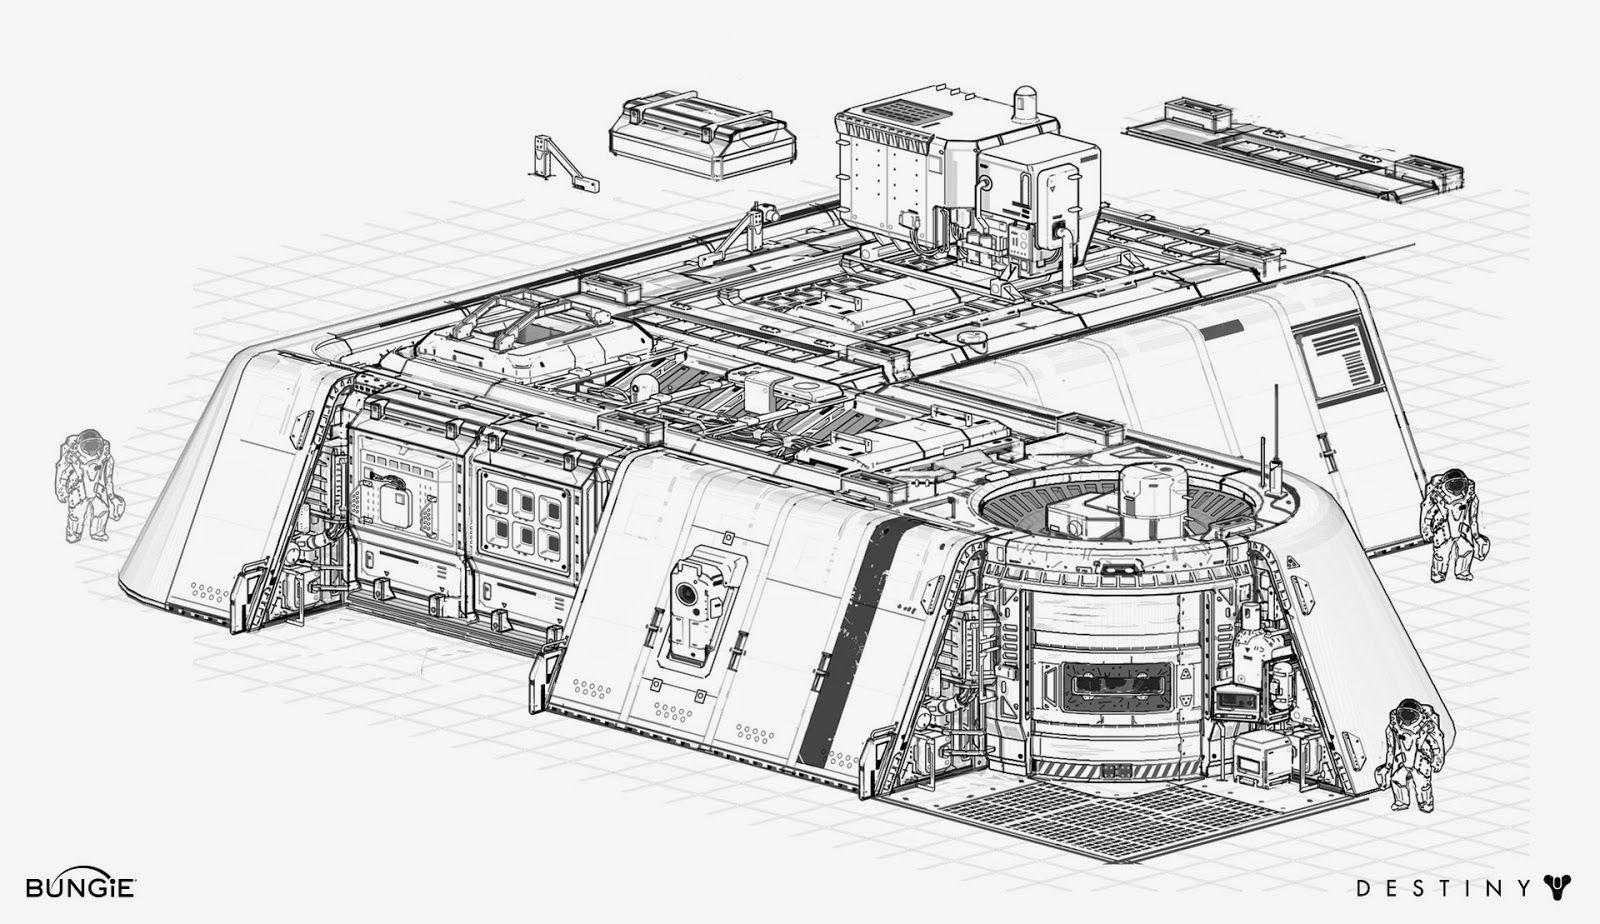 Dorje Destiny Moon Base